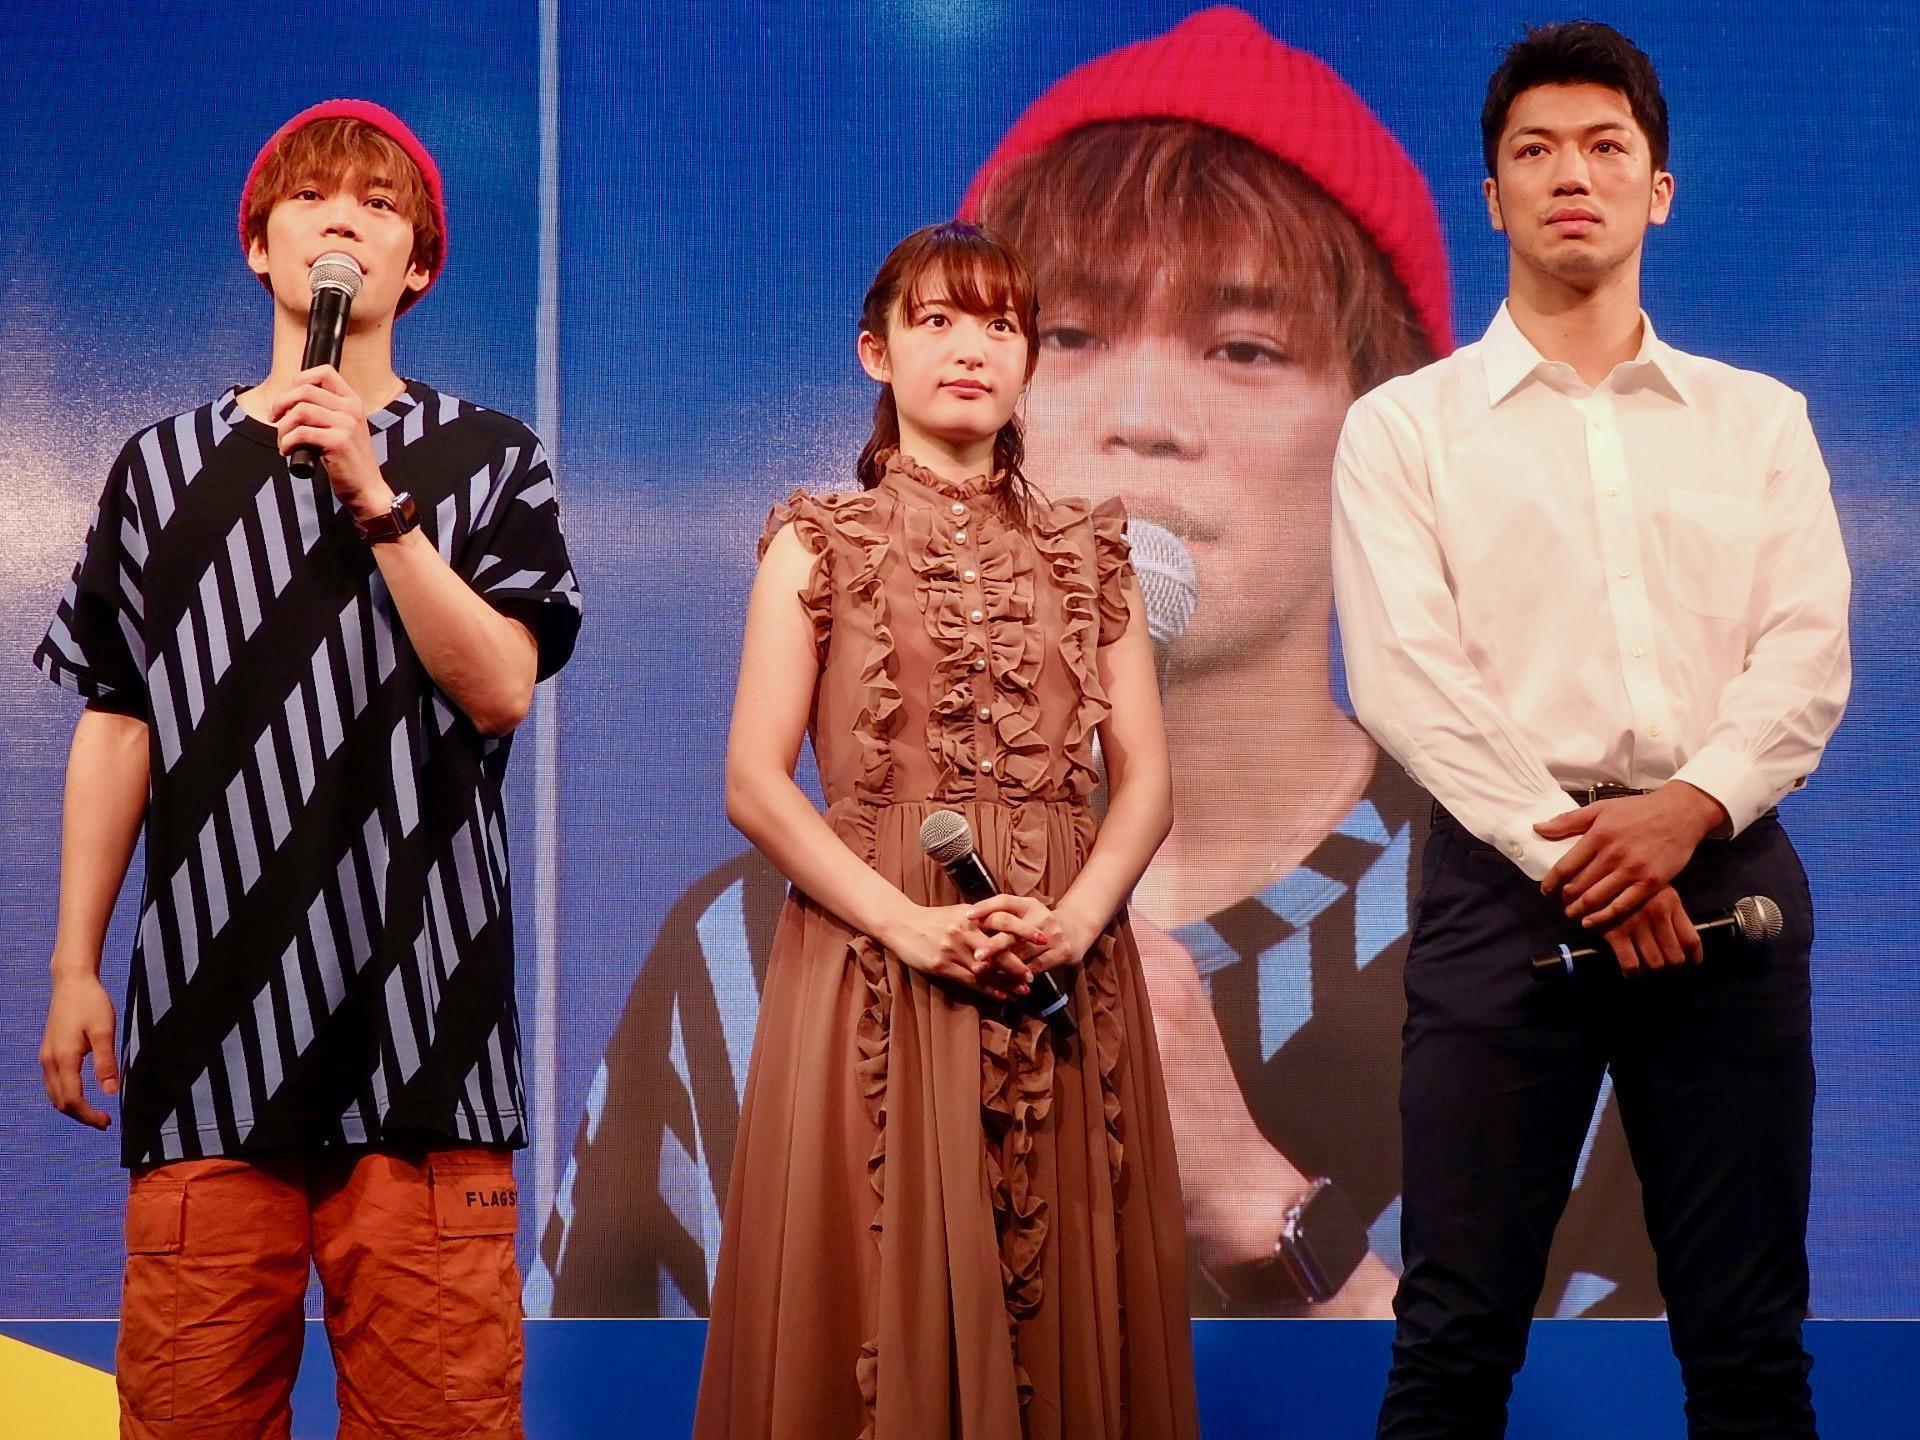 http://news.yoshimoto.co.jp/20180608120514-9dfcb642594f98e8c936fcdaaeb5506e585bb6cb.jpg